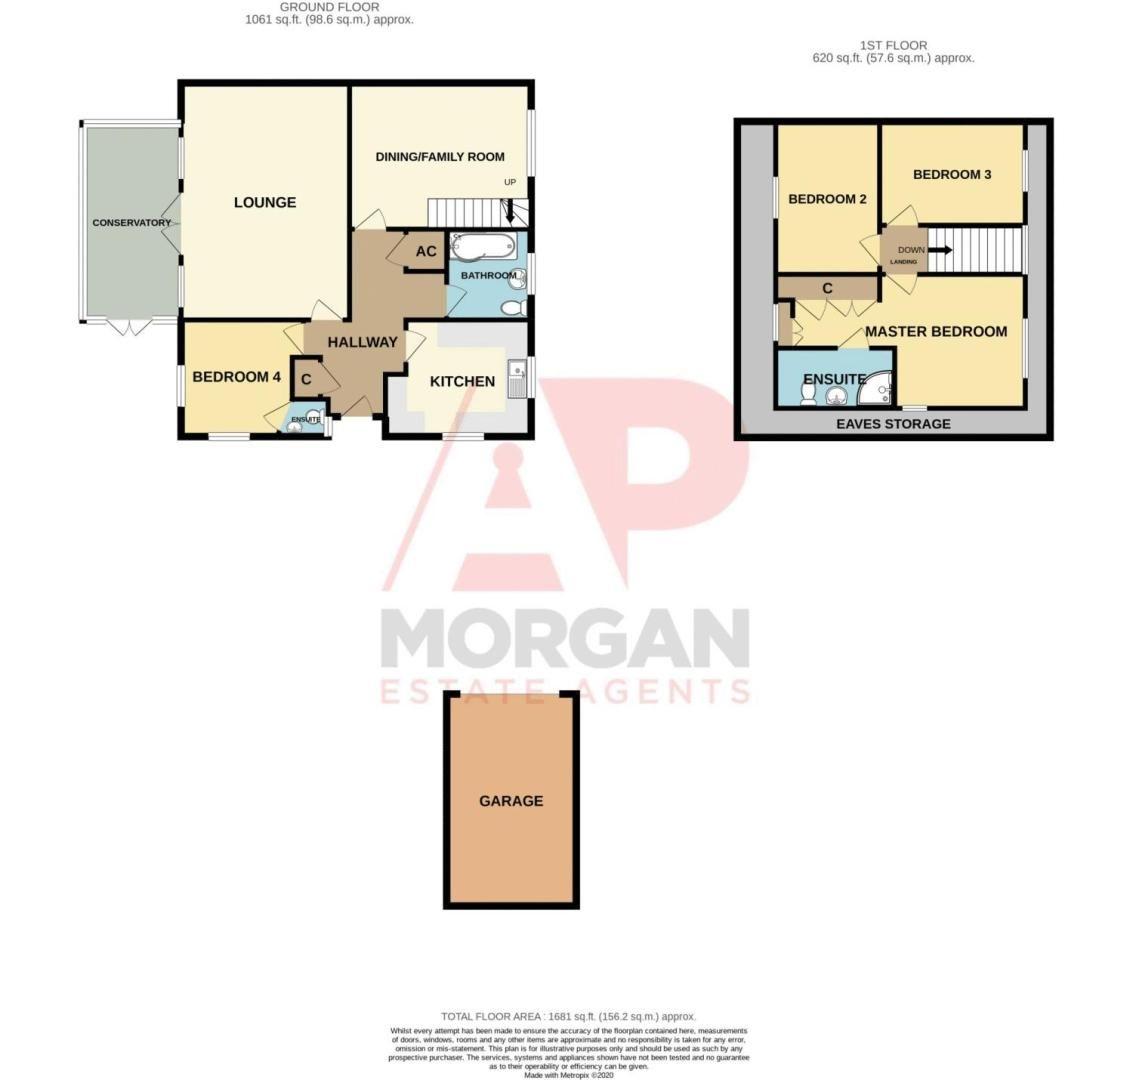 4 bed  for sale in Brooklands Lane - Property Floorplan